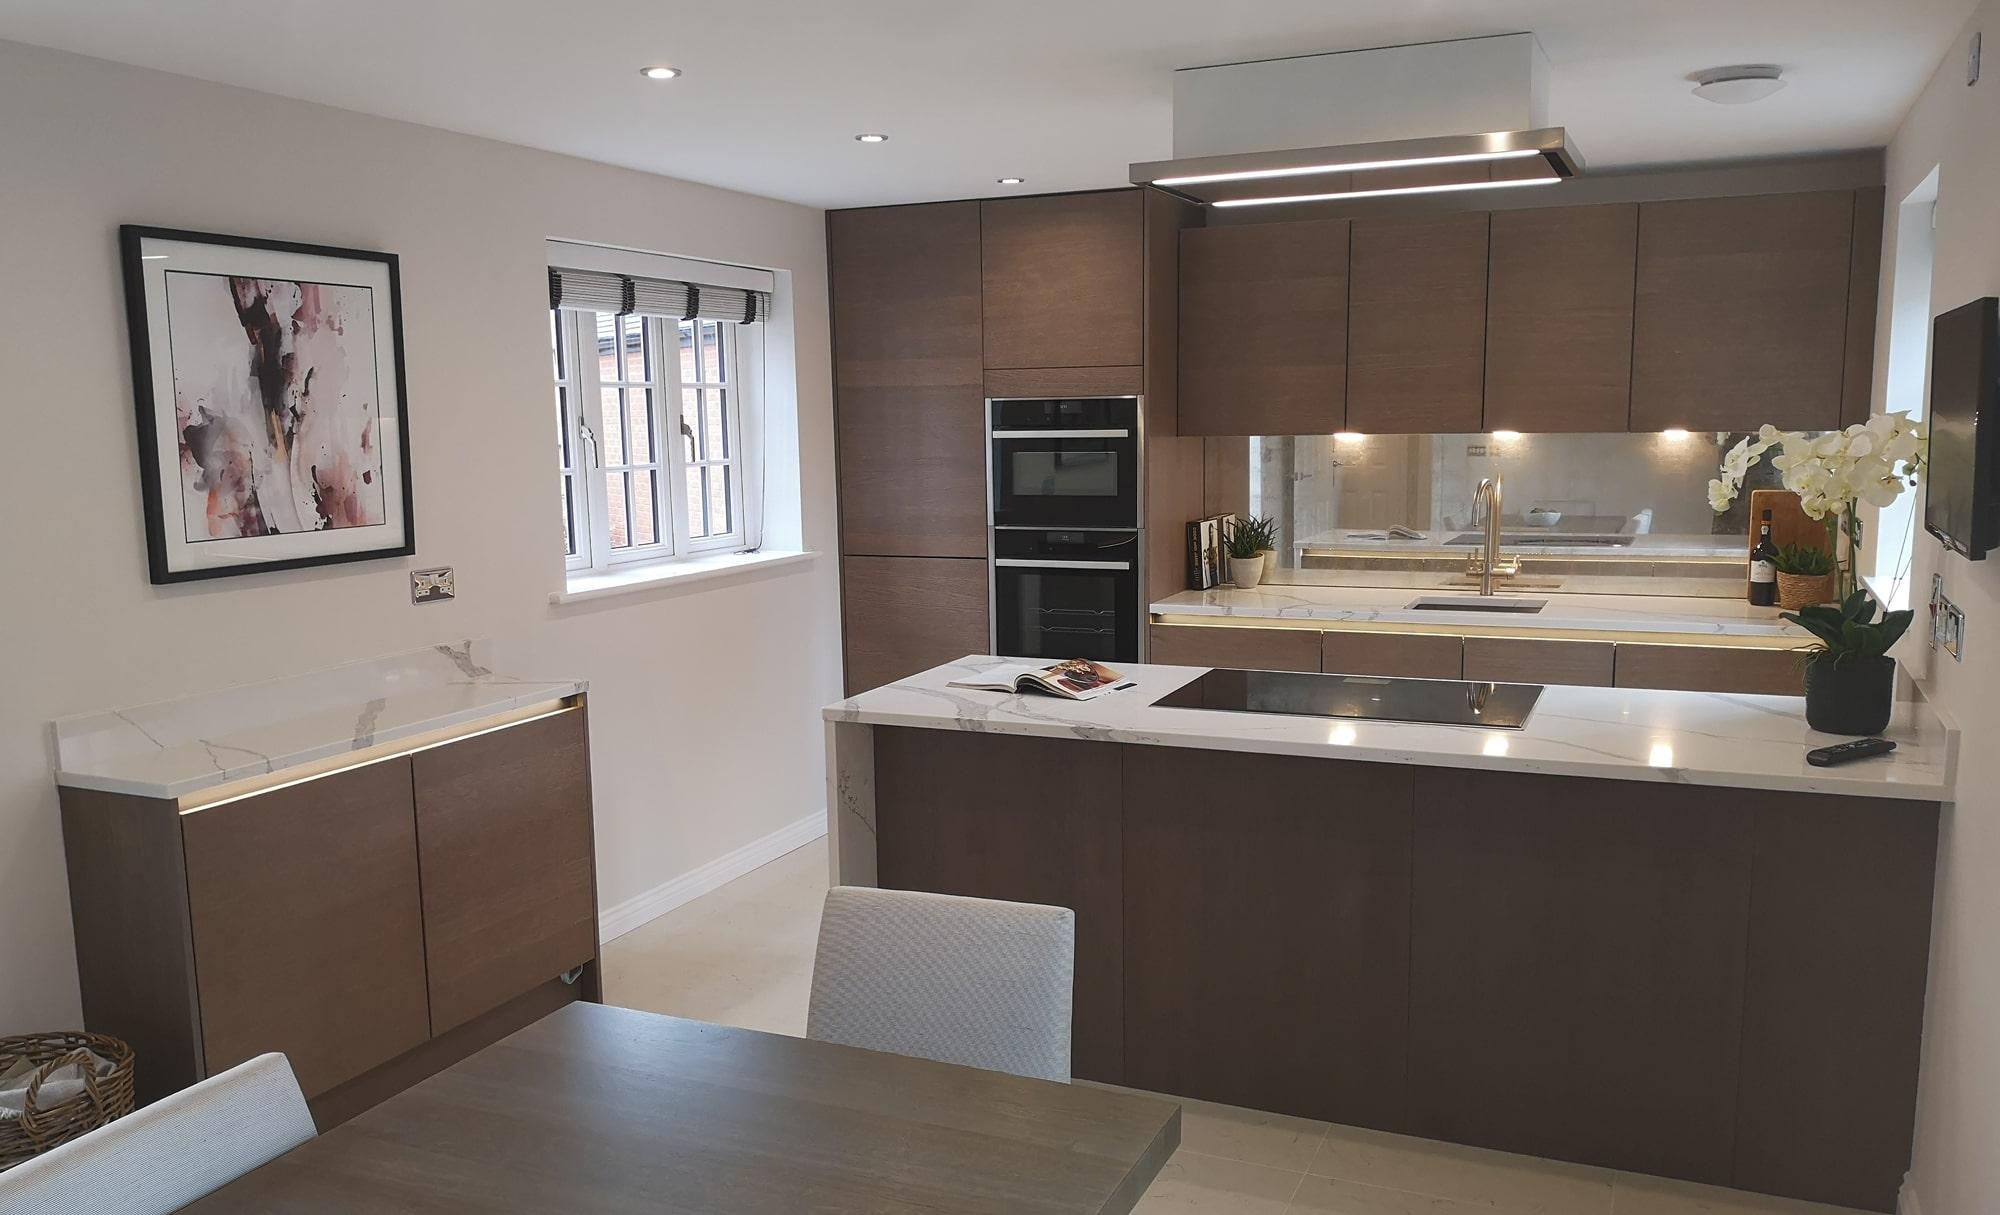 Kitchen Stori Tavola Kitchen for Mr & Mrs Horton by Saturn Interiors